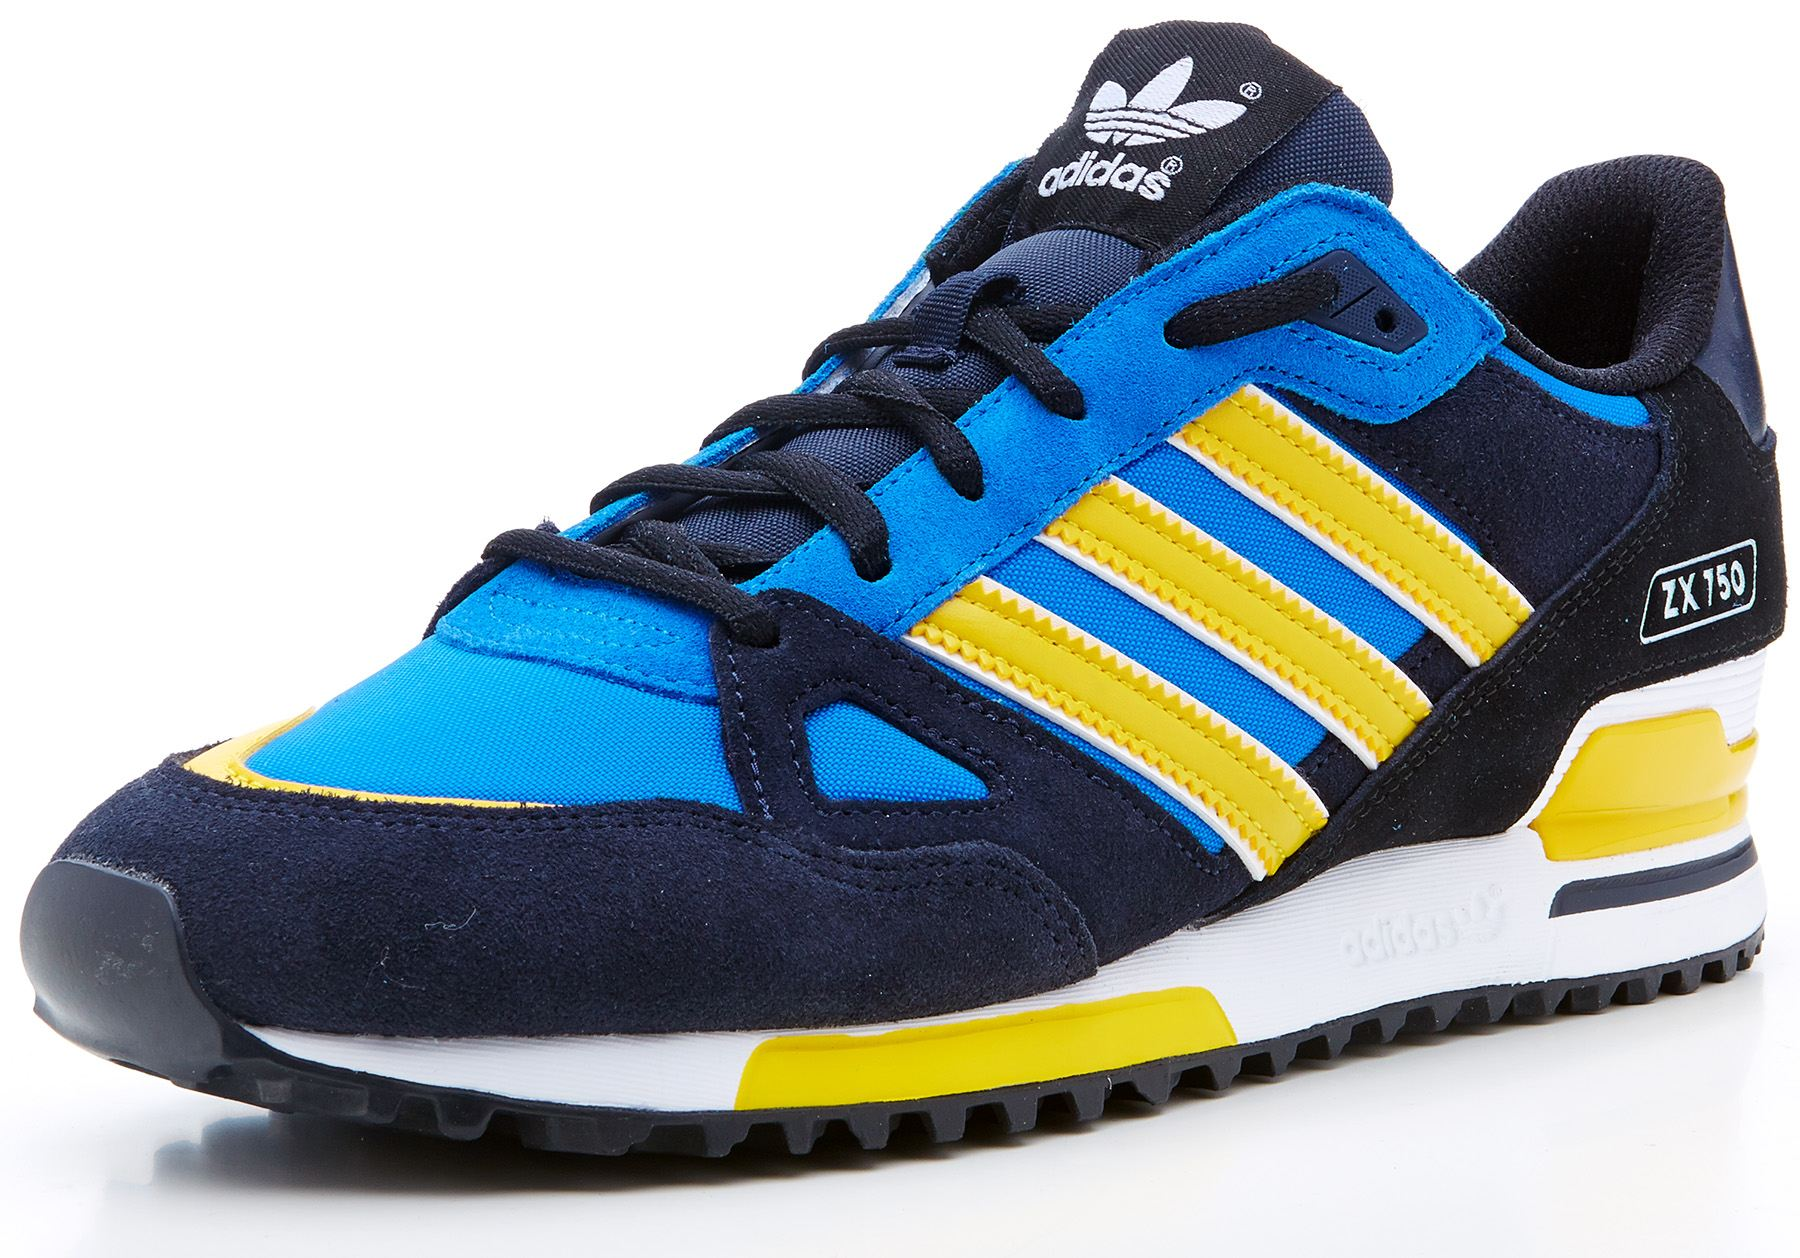 adidas zx 750 black yellow